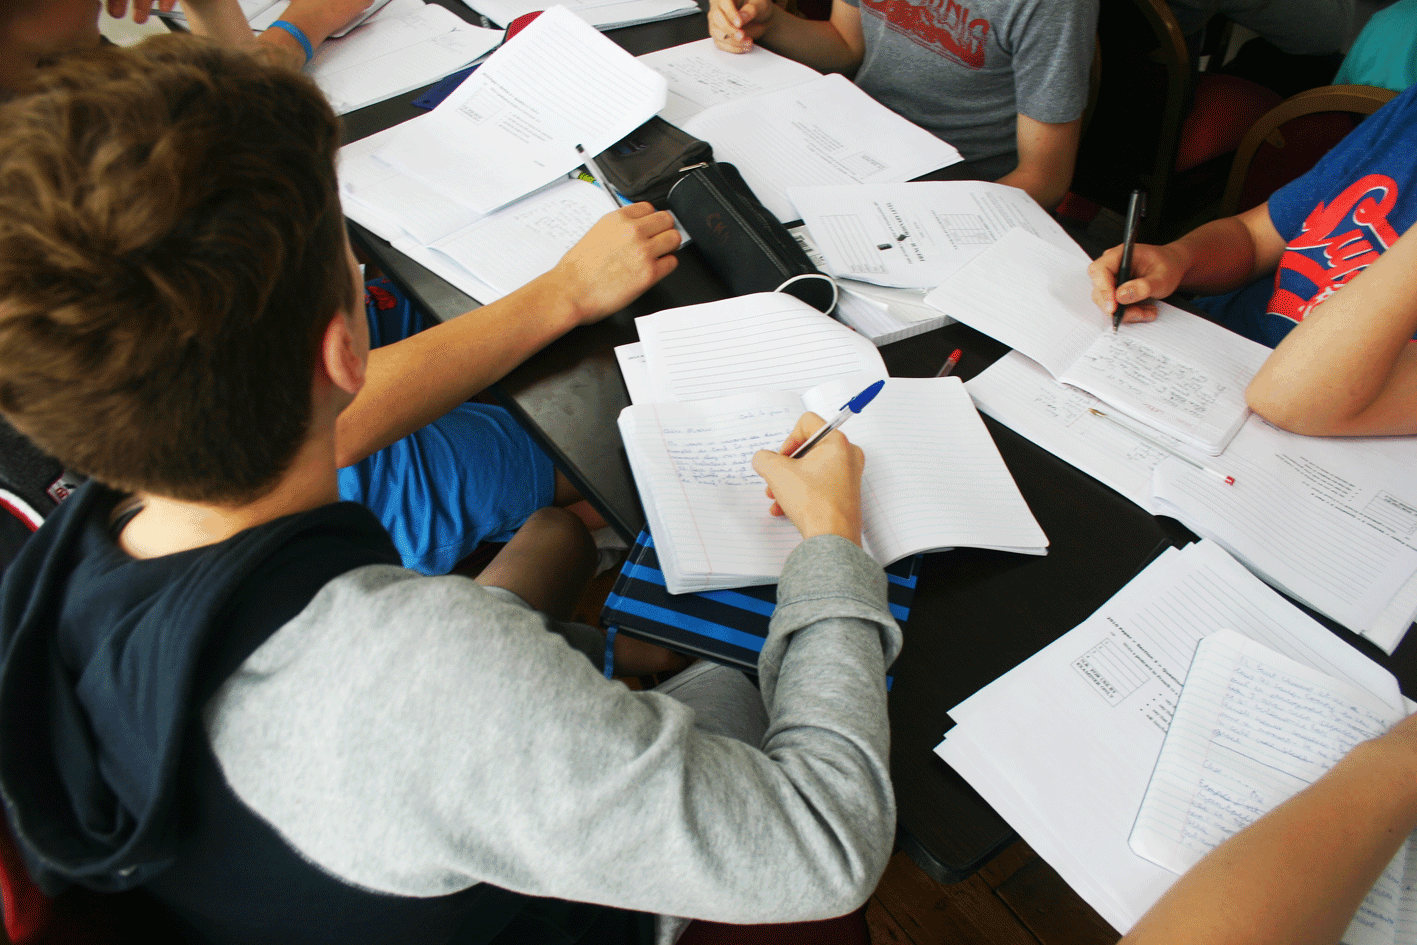 Ecole de mer student french class